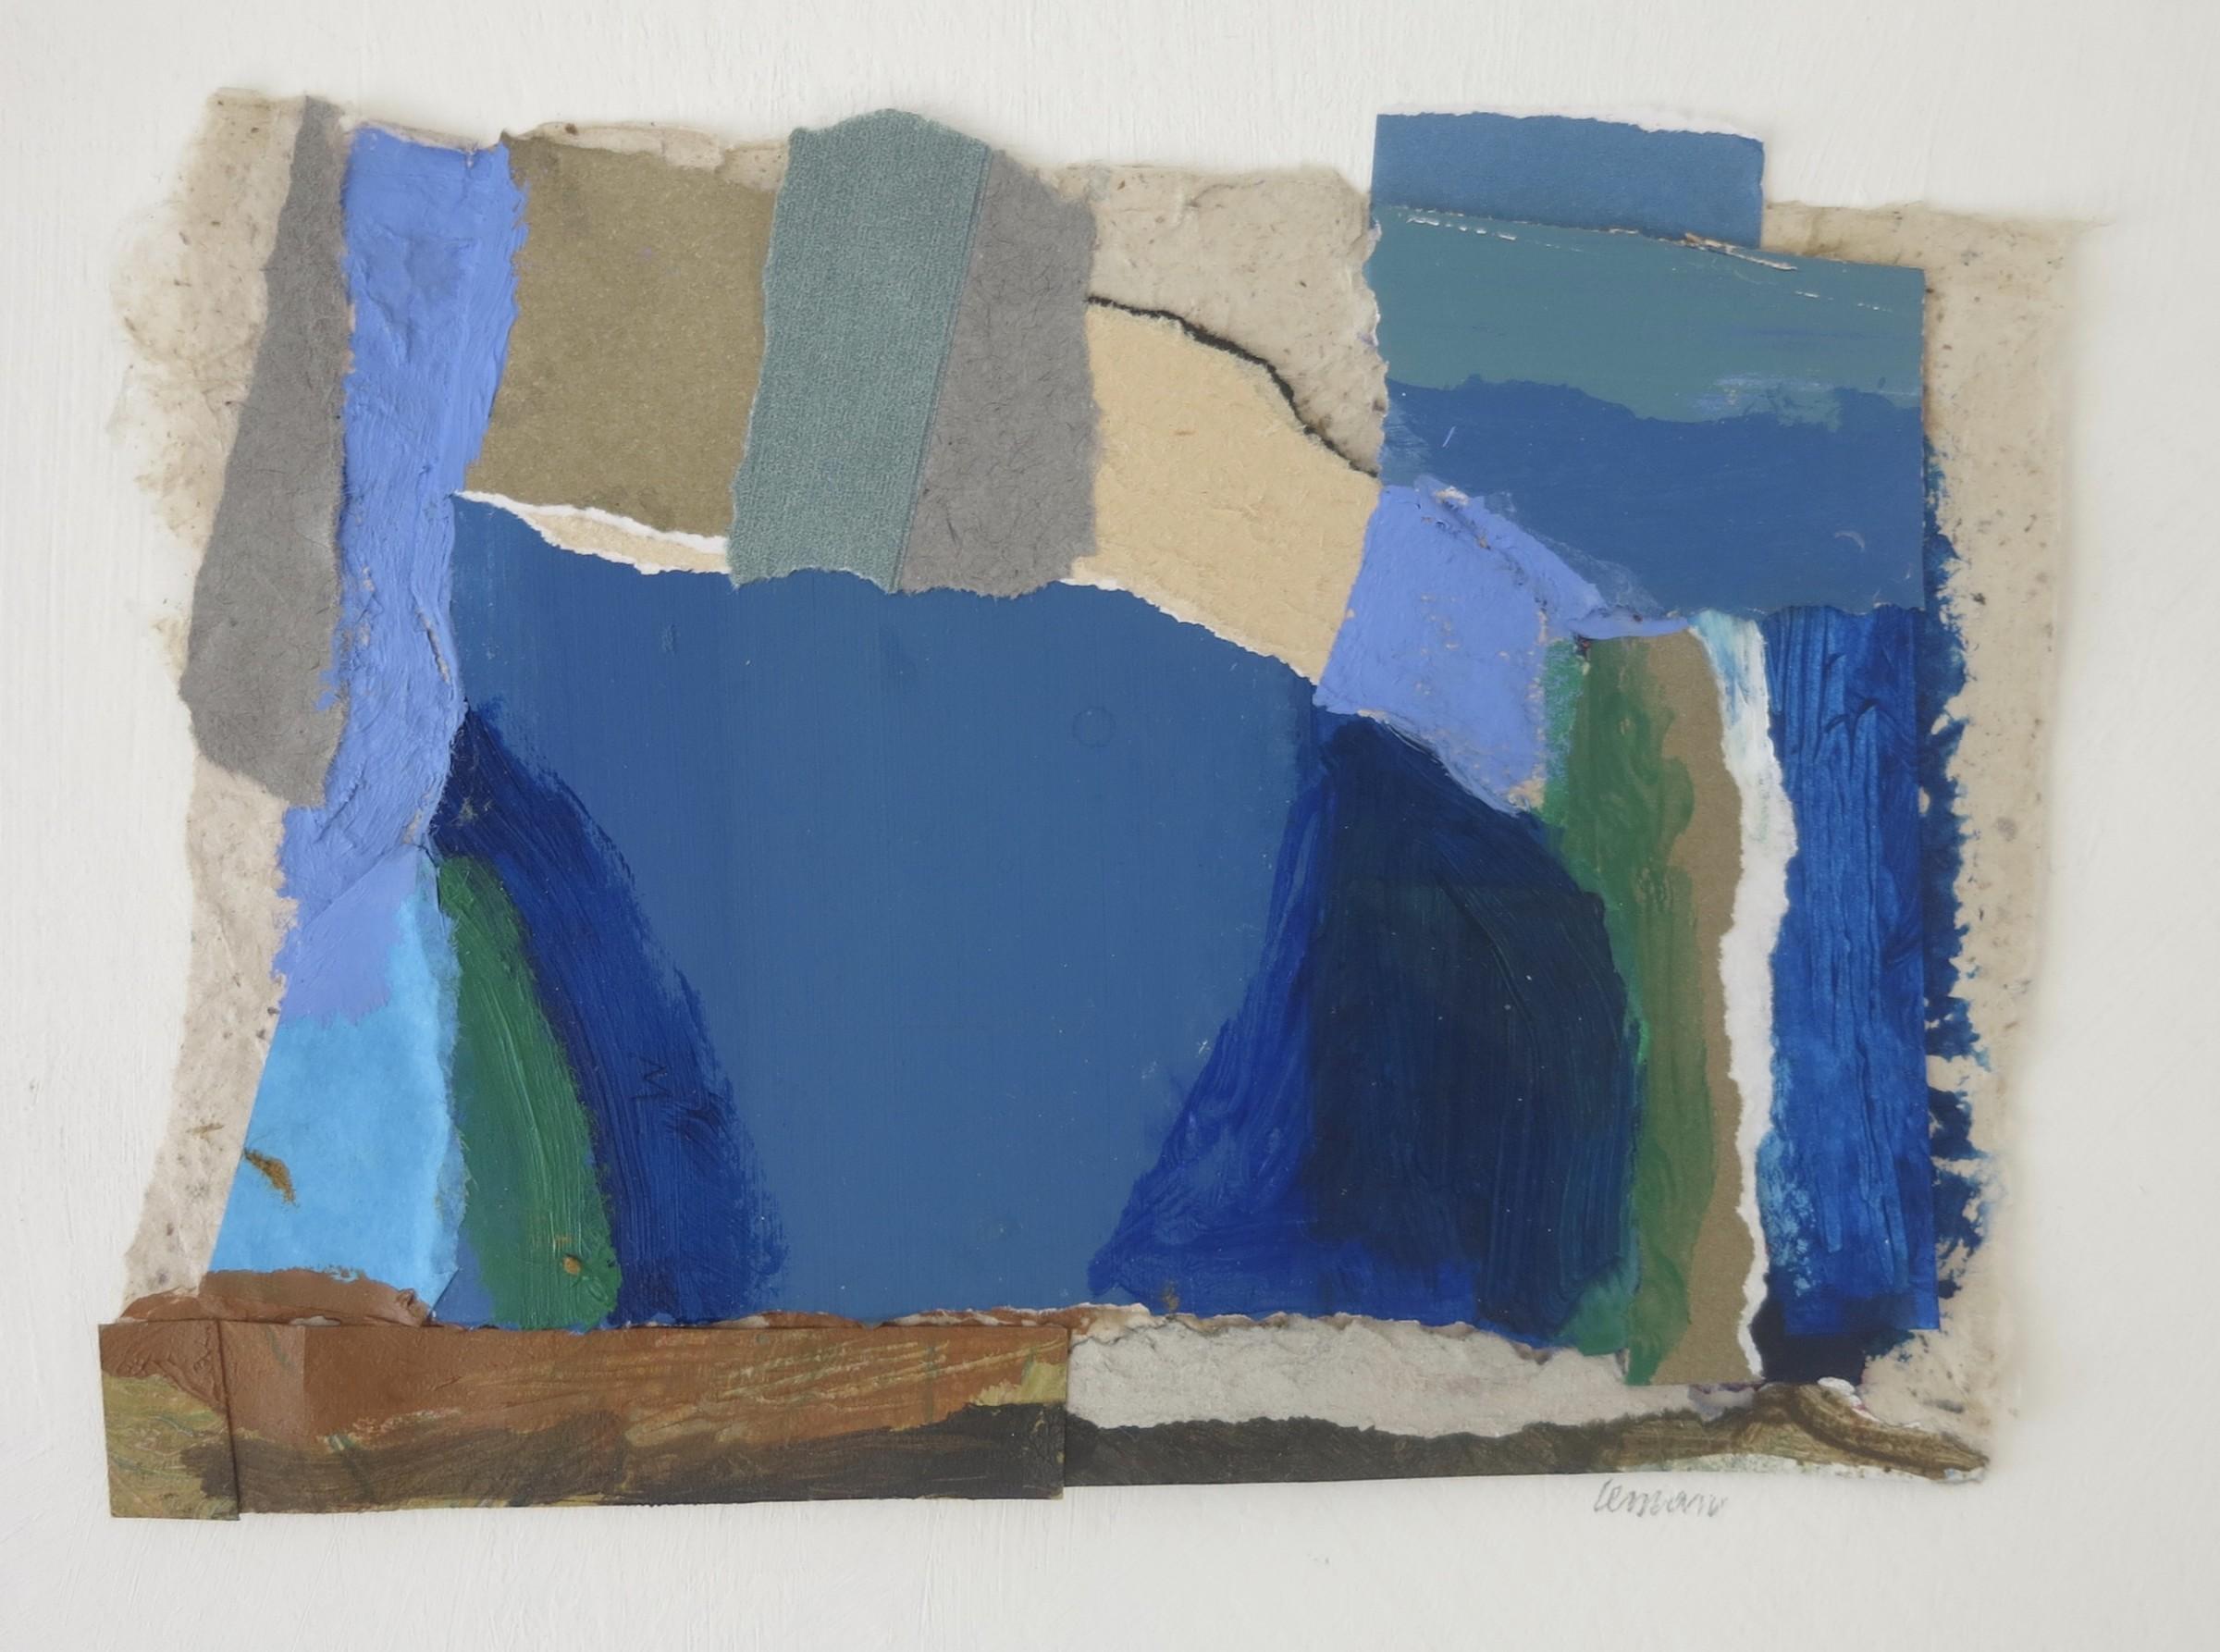 "<span class=""link fancybox-details-link""><a href=""/artists/78-martin-leman/works/12246-martin-leman-cornwall/"">View Detail Page</a></span><div class=""artist""><span class=""artist""><strong>Martin Leman</strong></span></div><div class=""title""><em>Cornwall</em></div><div class=""medium"">acrylic & collage</div><div class=""dimensions"">Frame: 22 x 27 cm<br /> Artwork: 12 x 17 cm</div><div class=""price"">£450.00</div>"